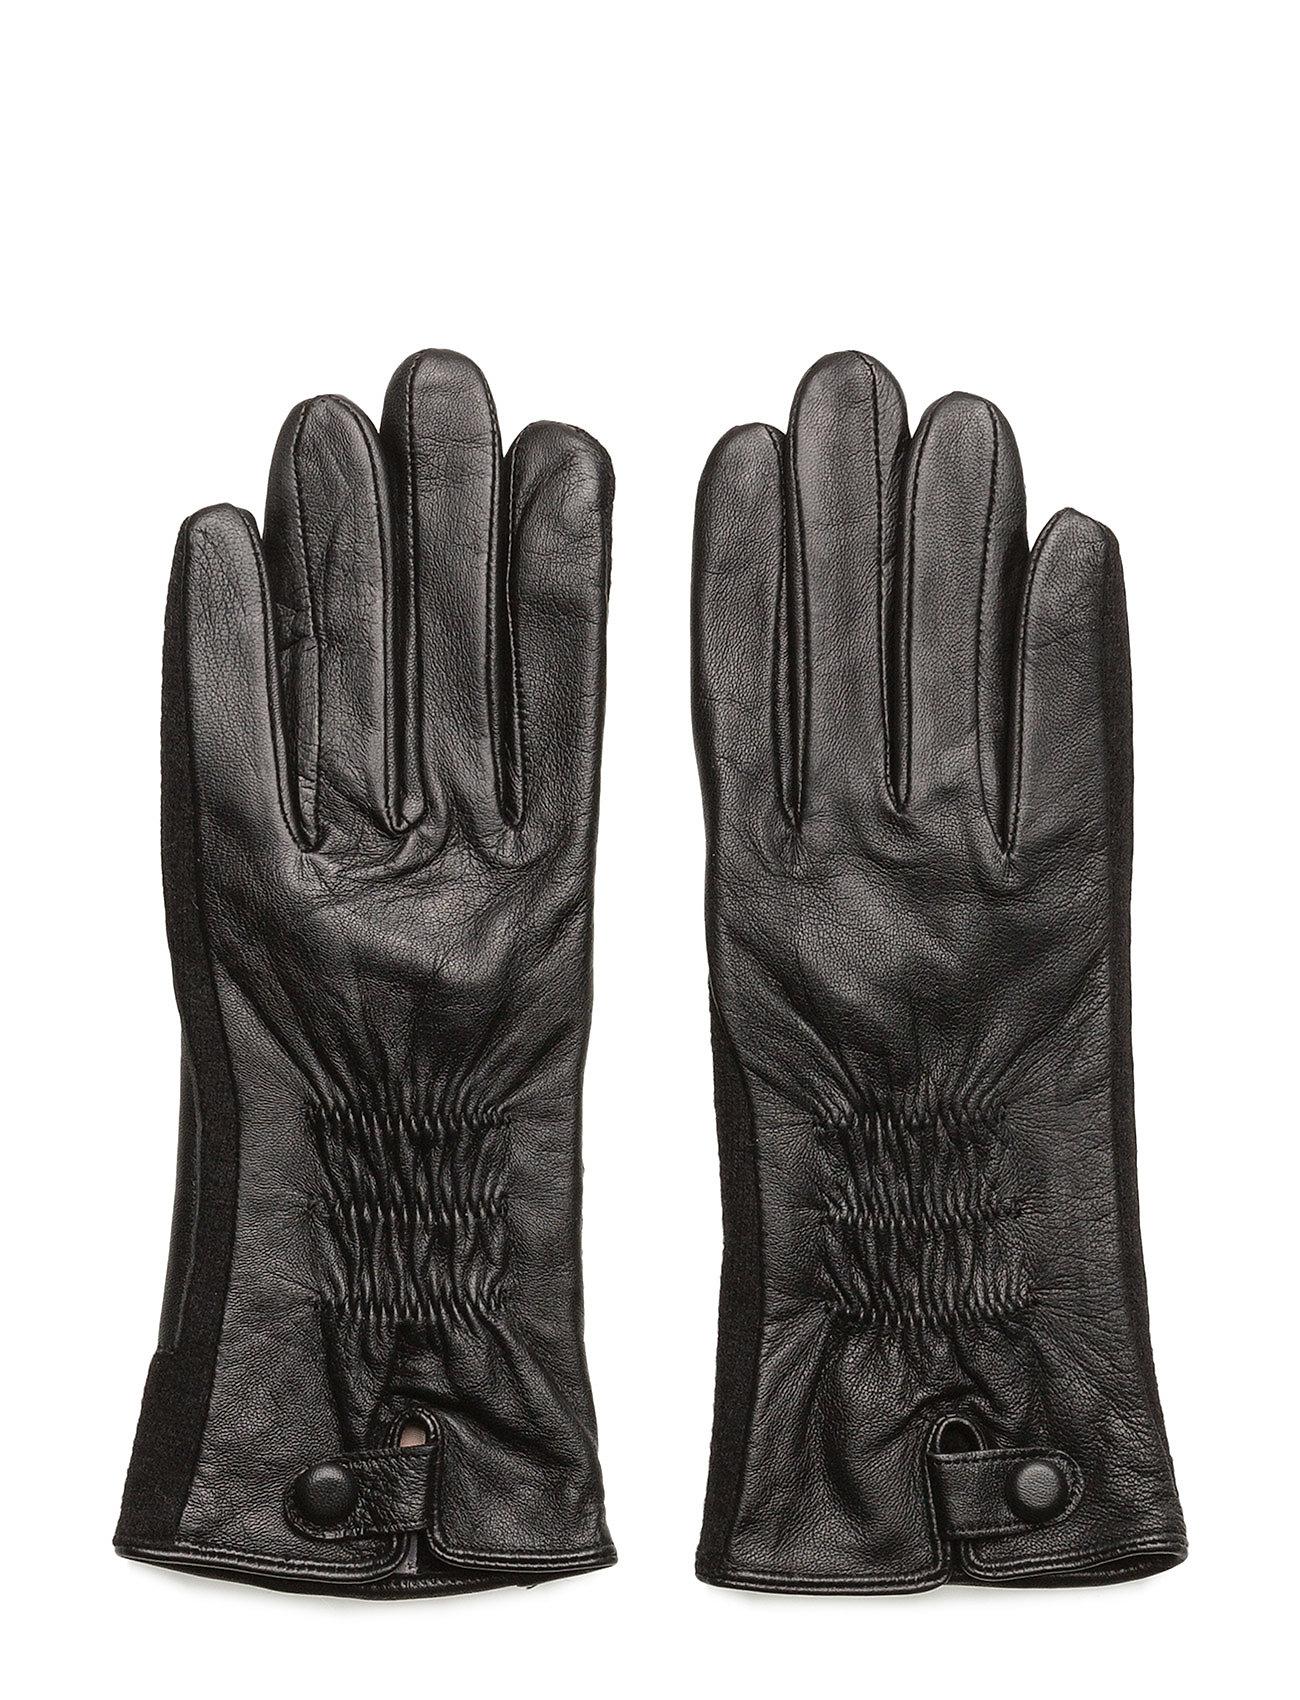 Leather and felt glove fra unmade copenhagen på boozt.com dk